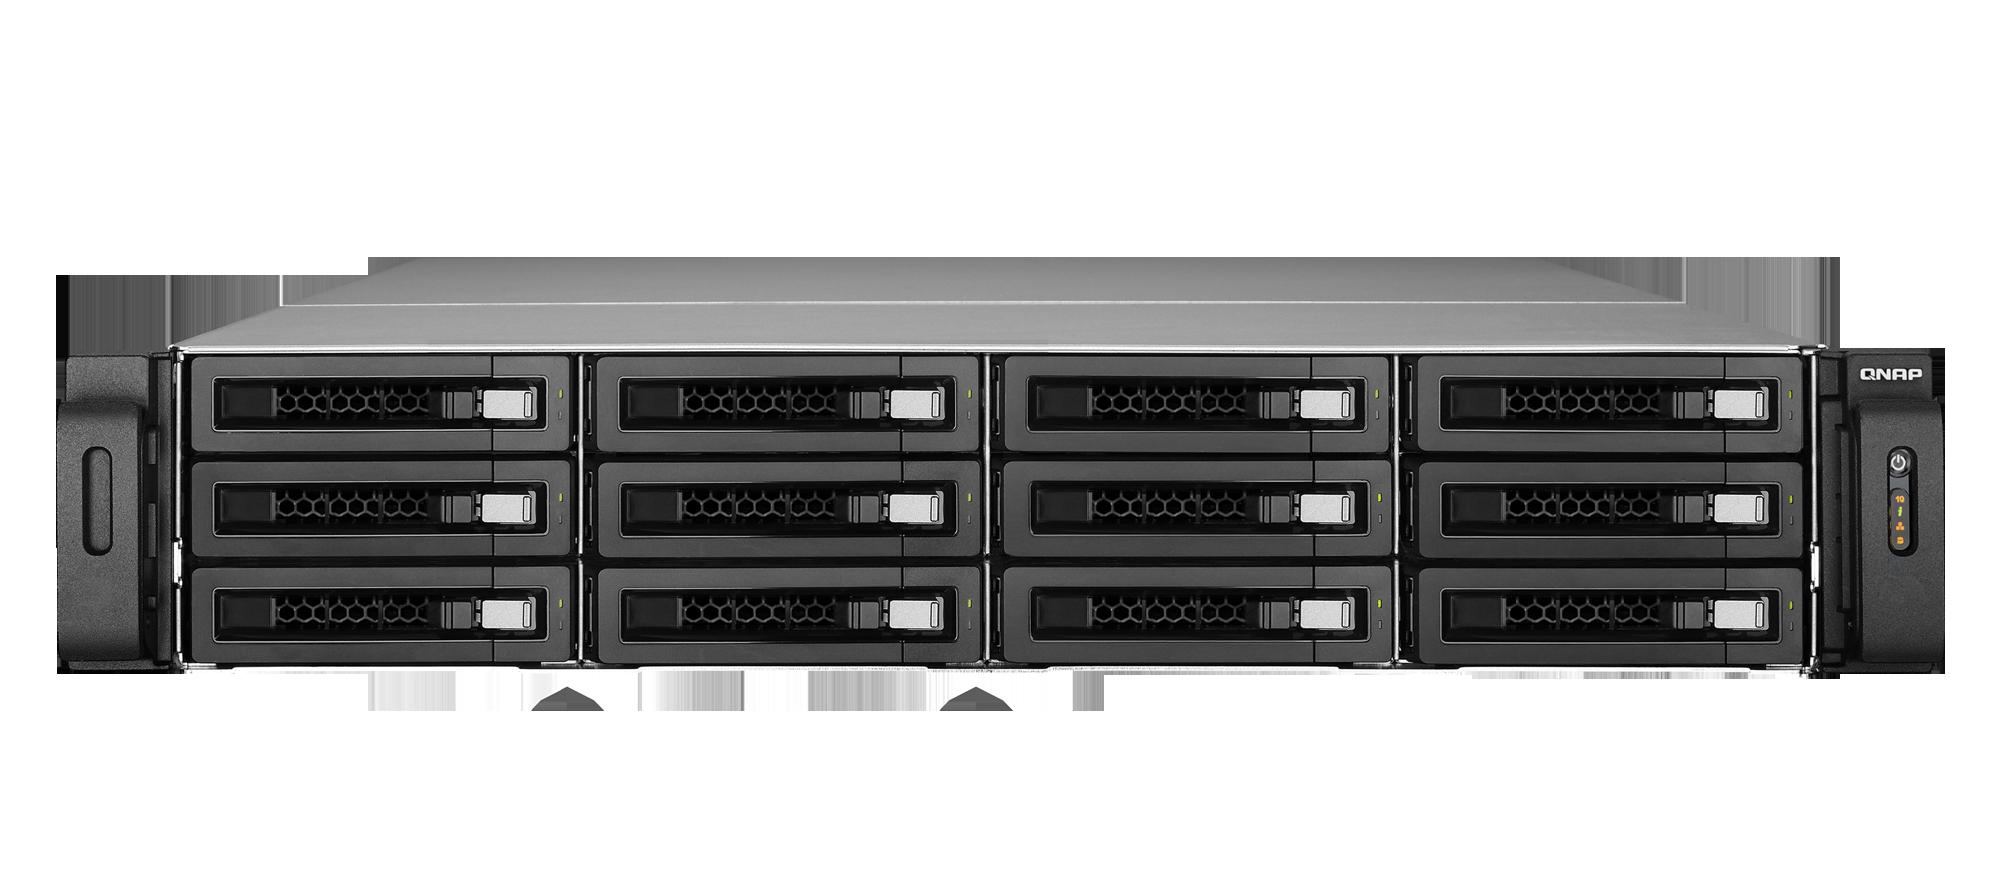 sc 1 st  AnandTech & QNAPu0027s TS-EC1279U-RP 12-bay Flagship Rackmount NAS Review